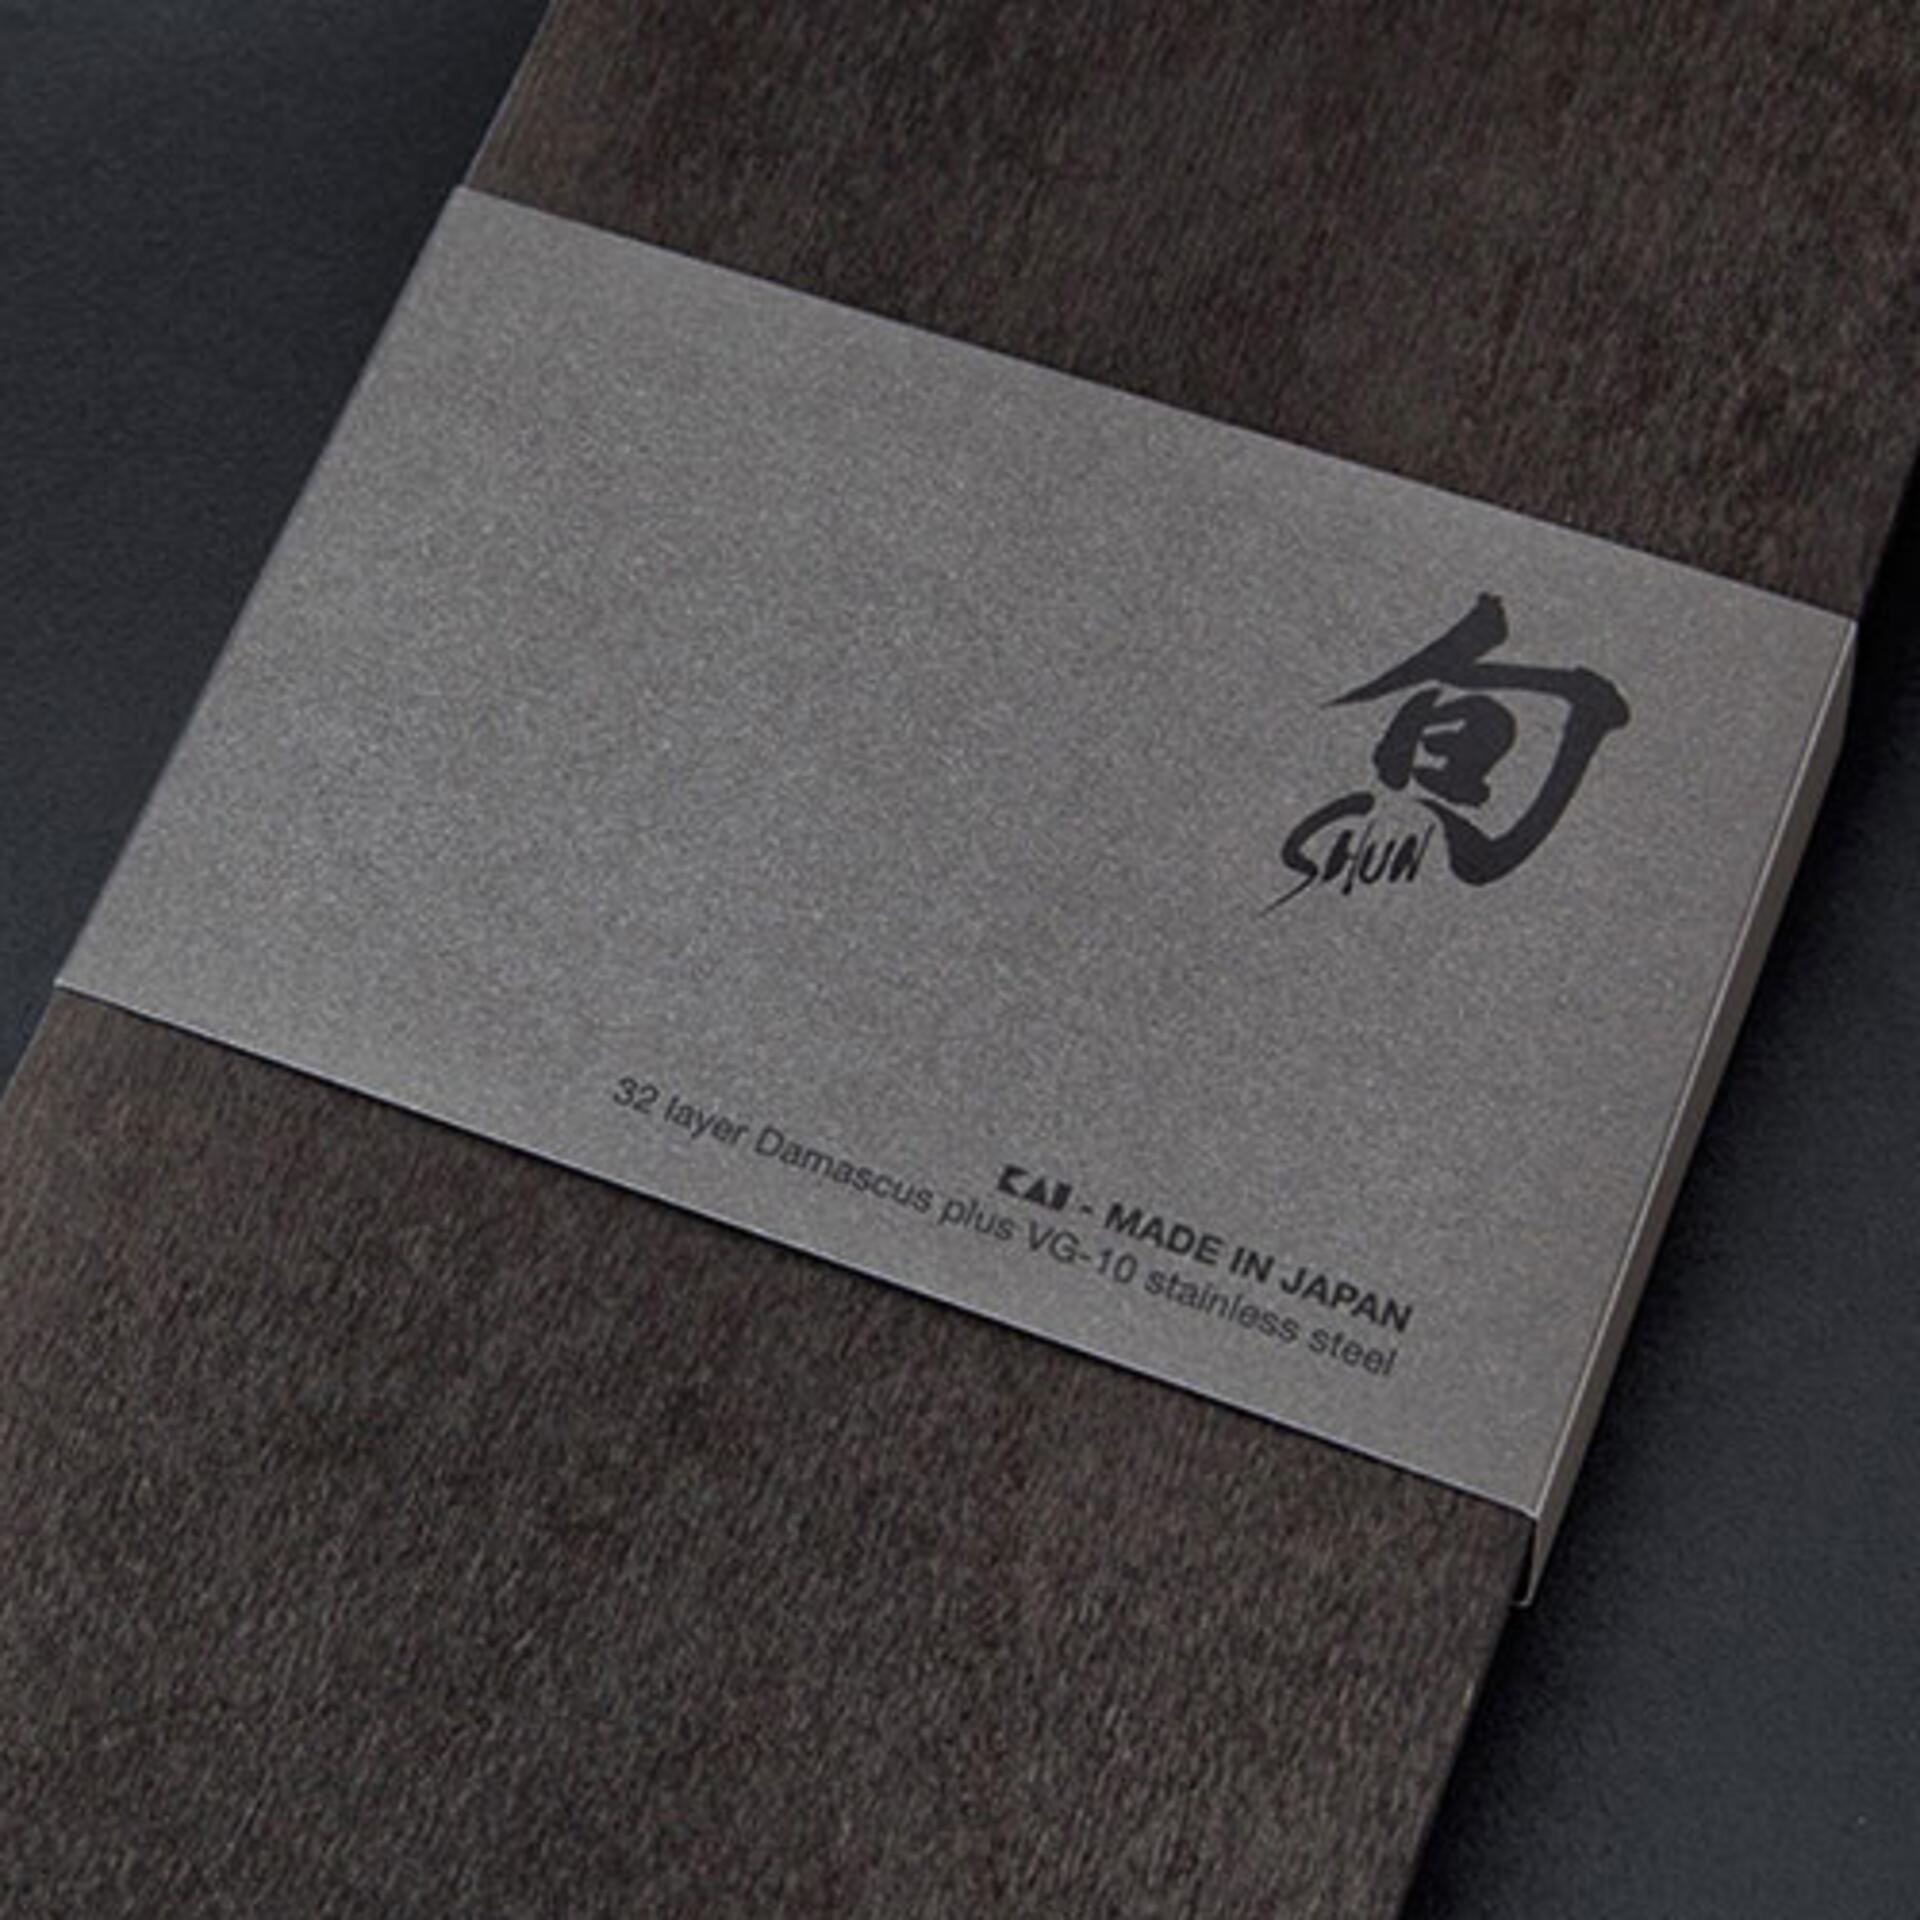 KAI Shun Classic Kleines Kochmesser DM-0723